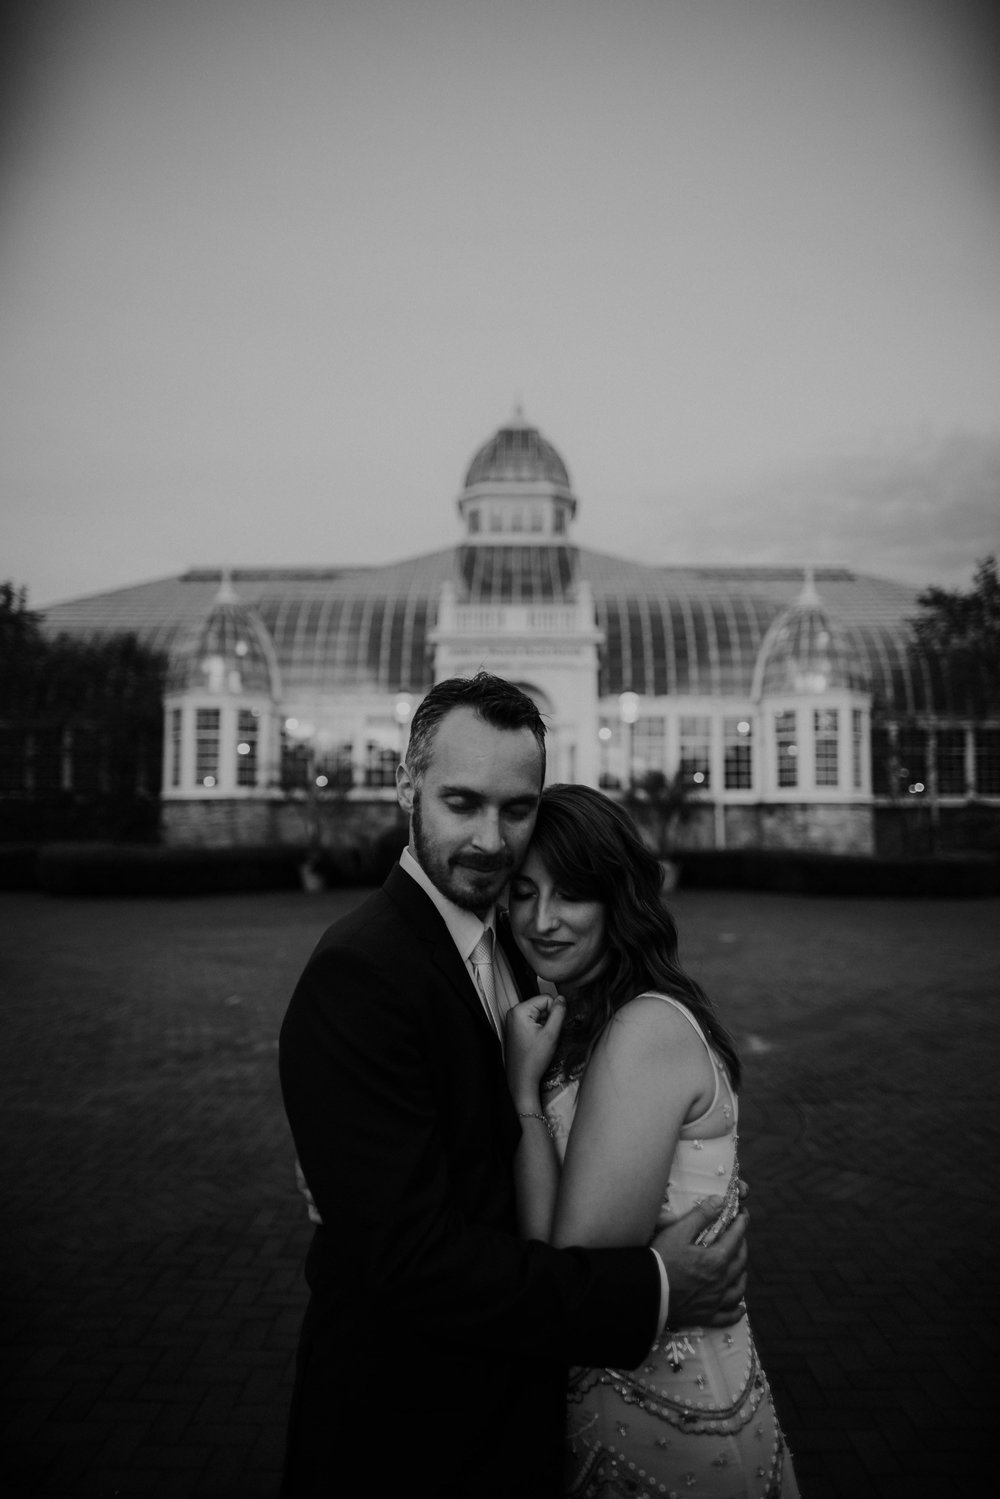 franklin park conservatory wedding columbus ohio wedding photographer grace e jones photography59.jpg